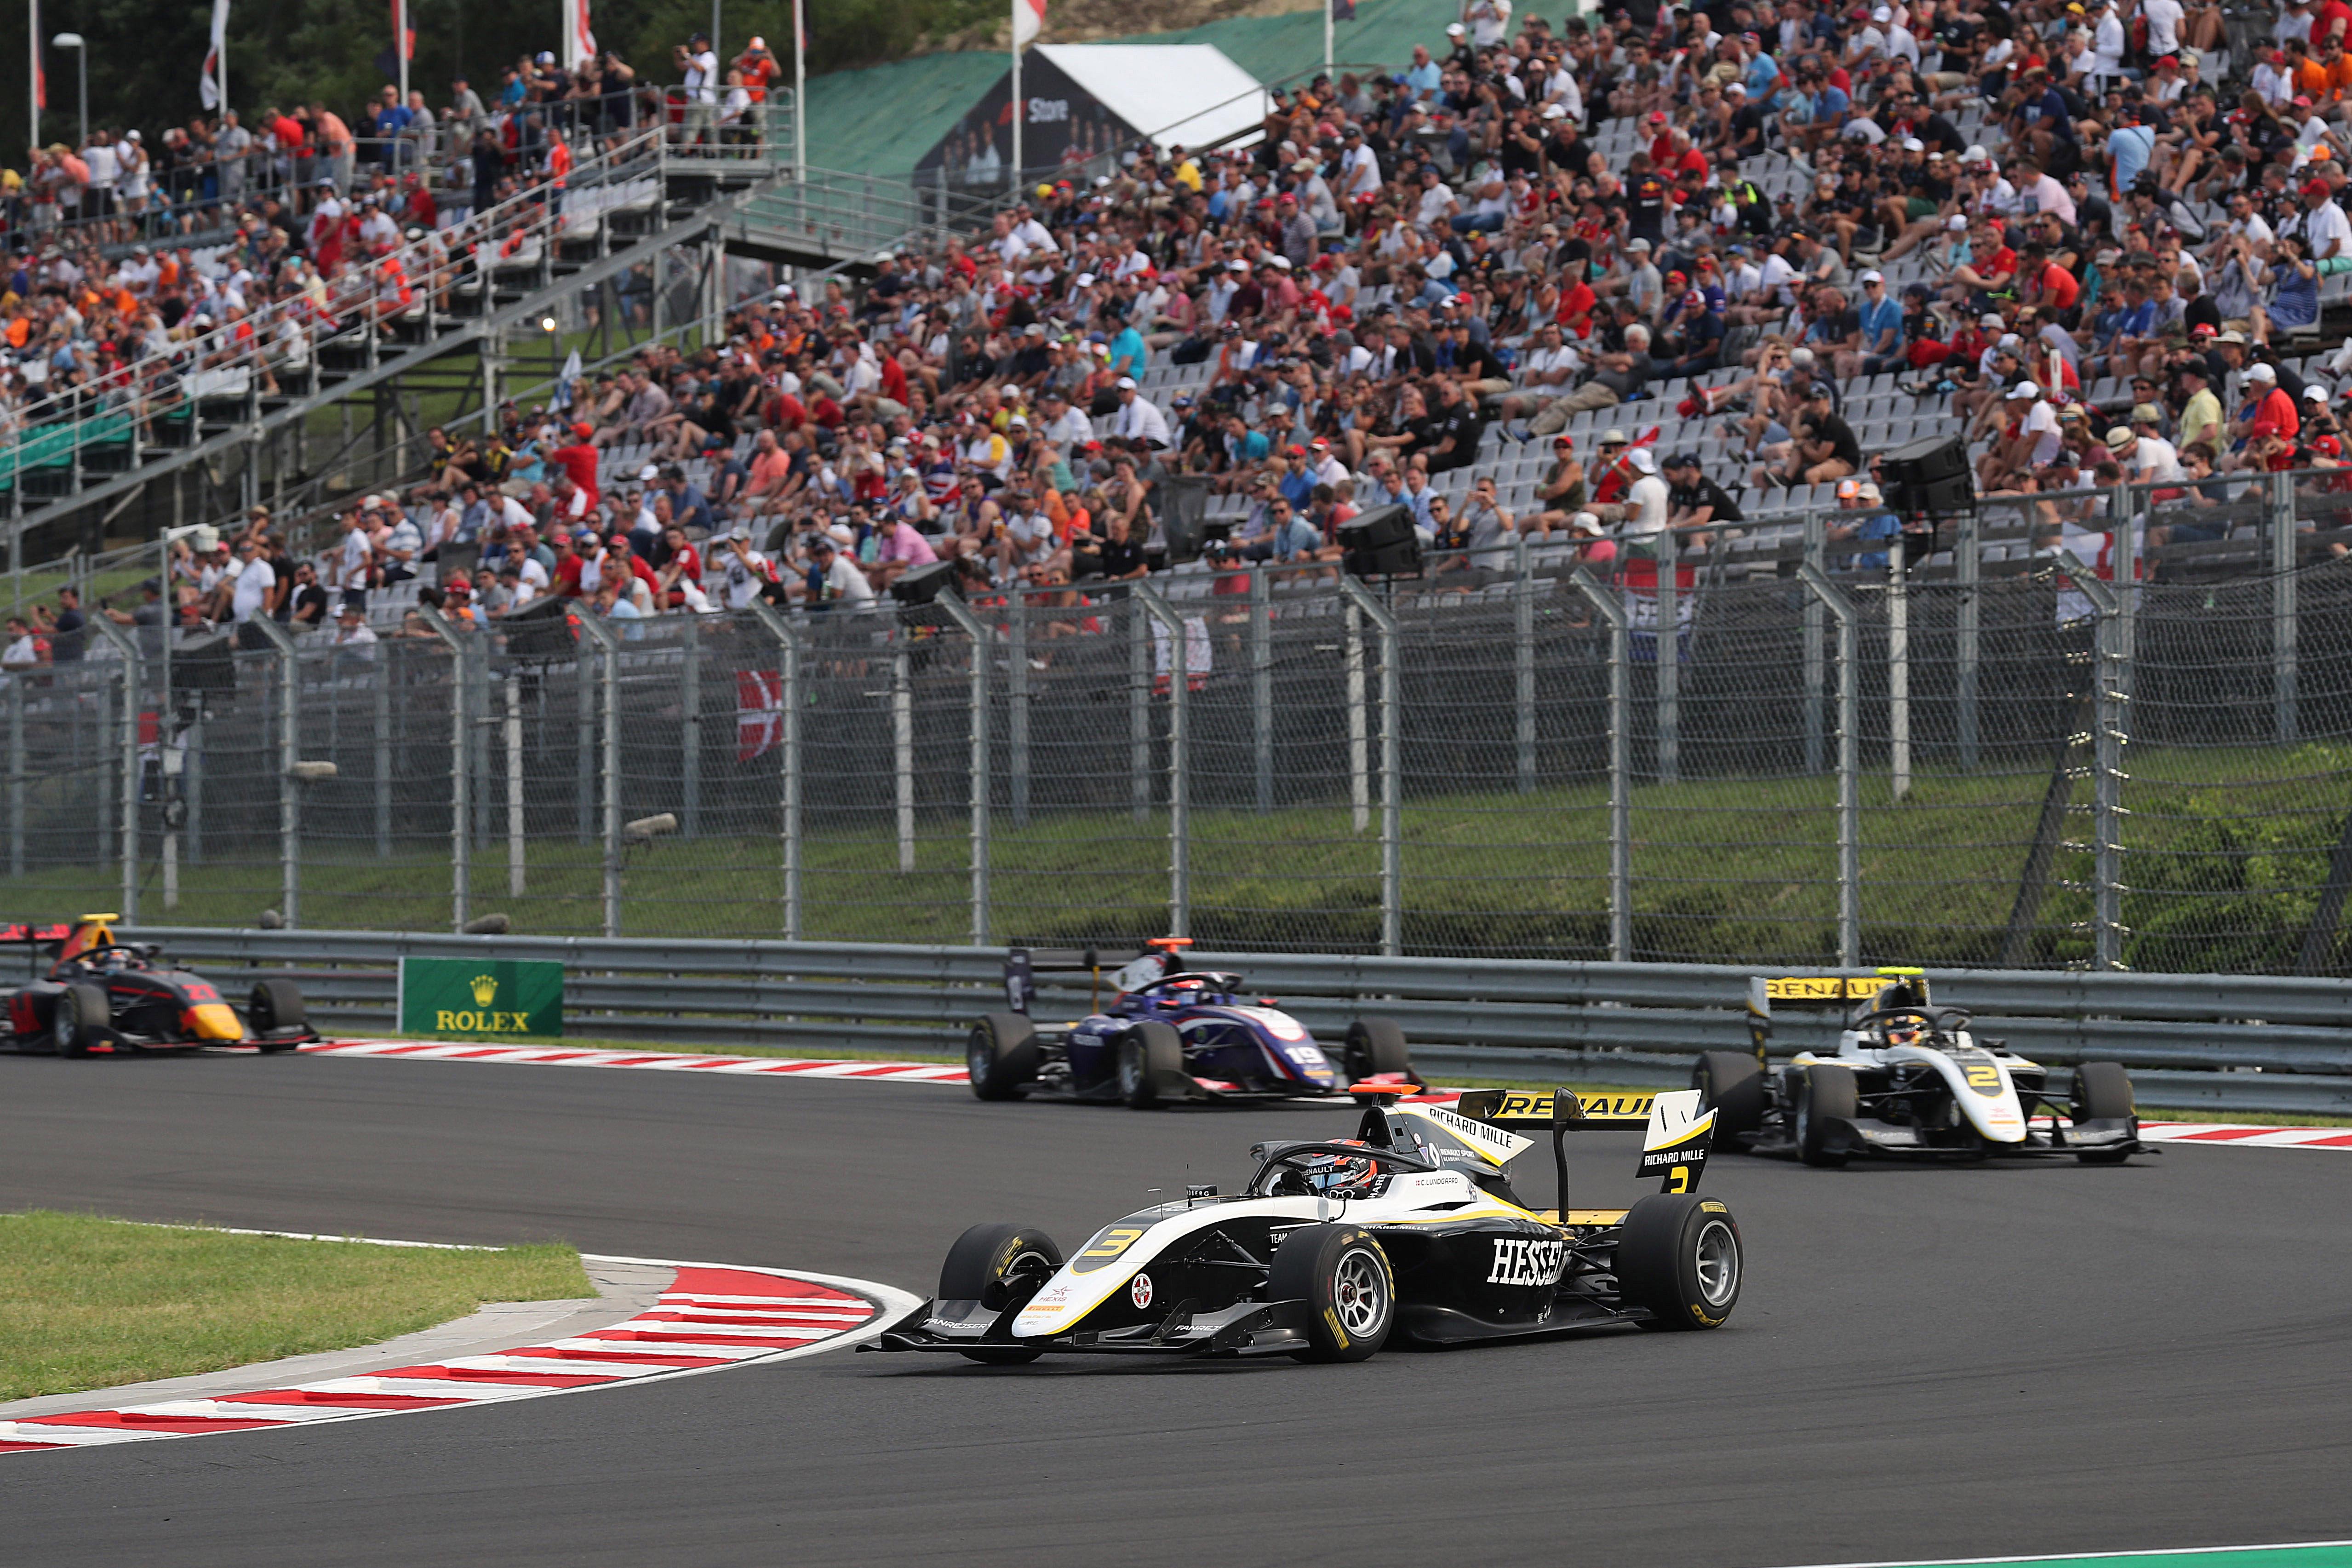 Motor Racing Fia Formula 3 Championship Saturday Budapest, Hungary